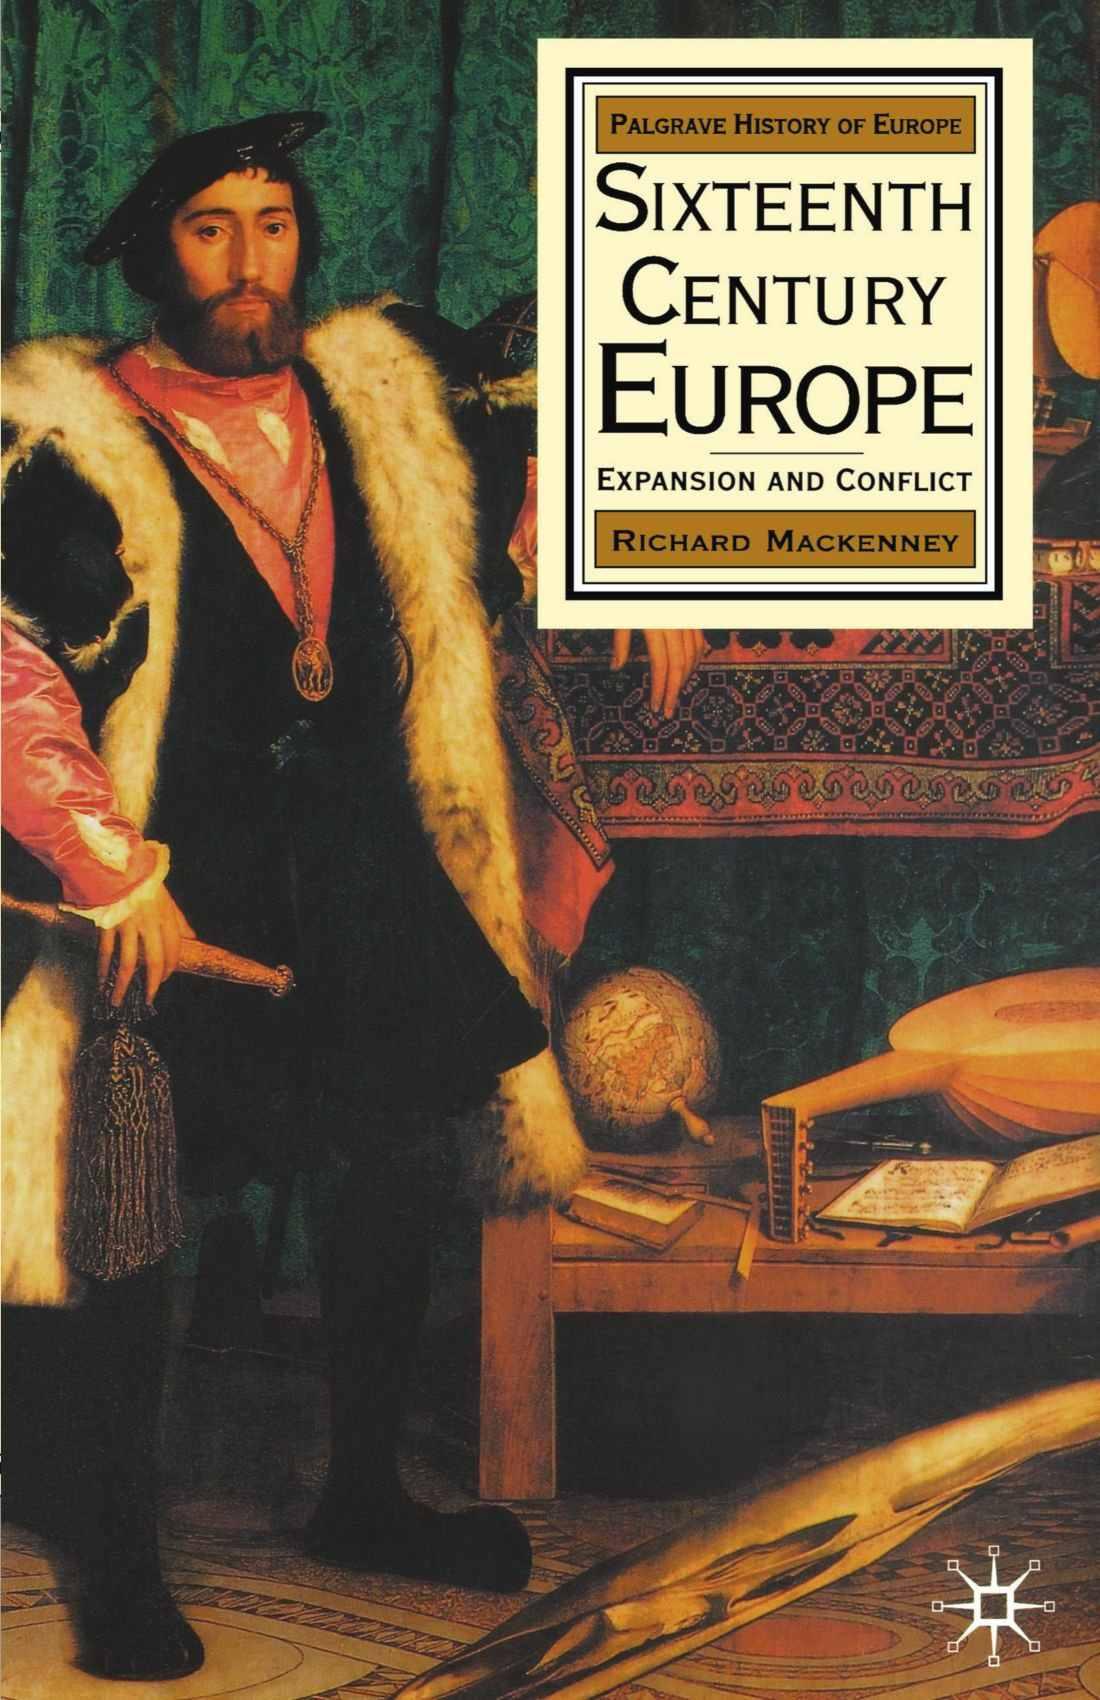 Sixteenth Century Europe 1500-1600 by Richard Mackenney